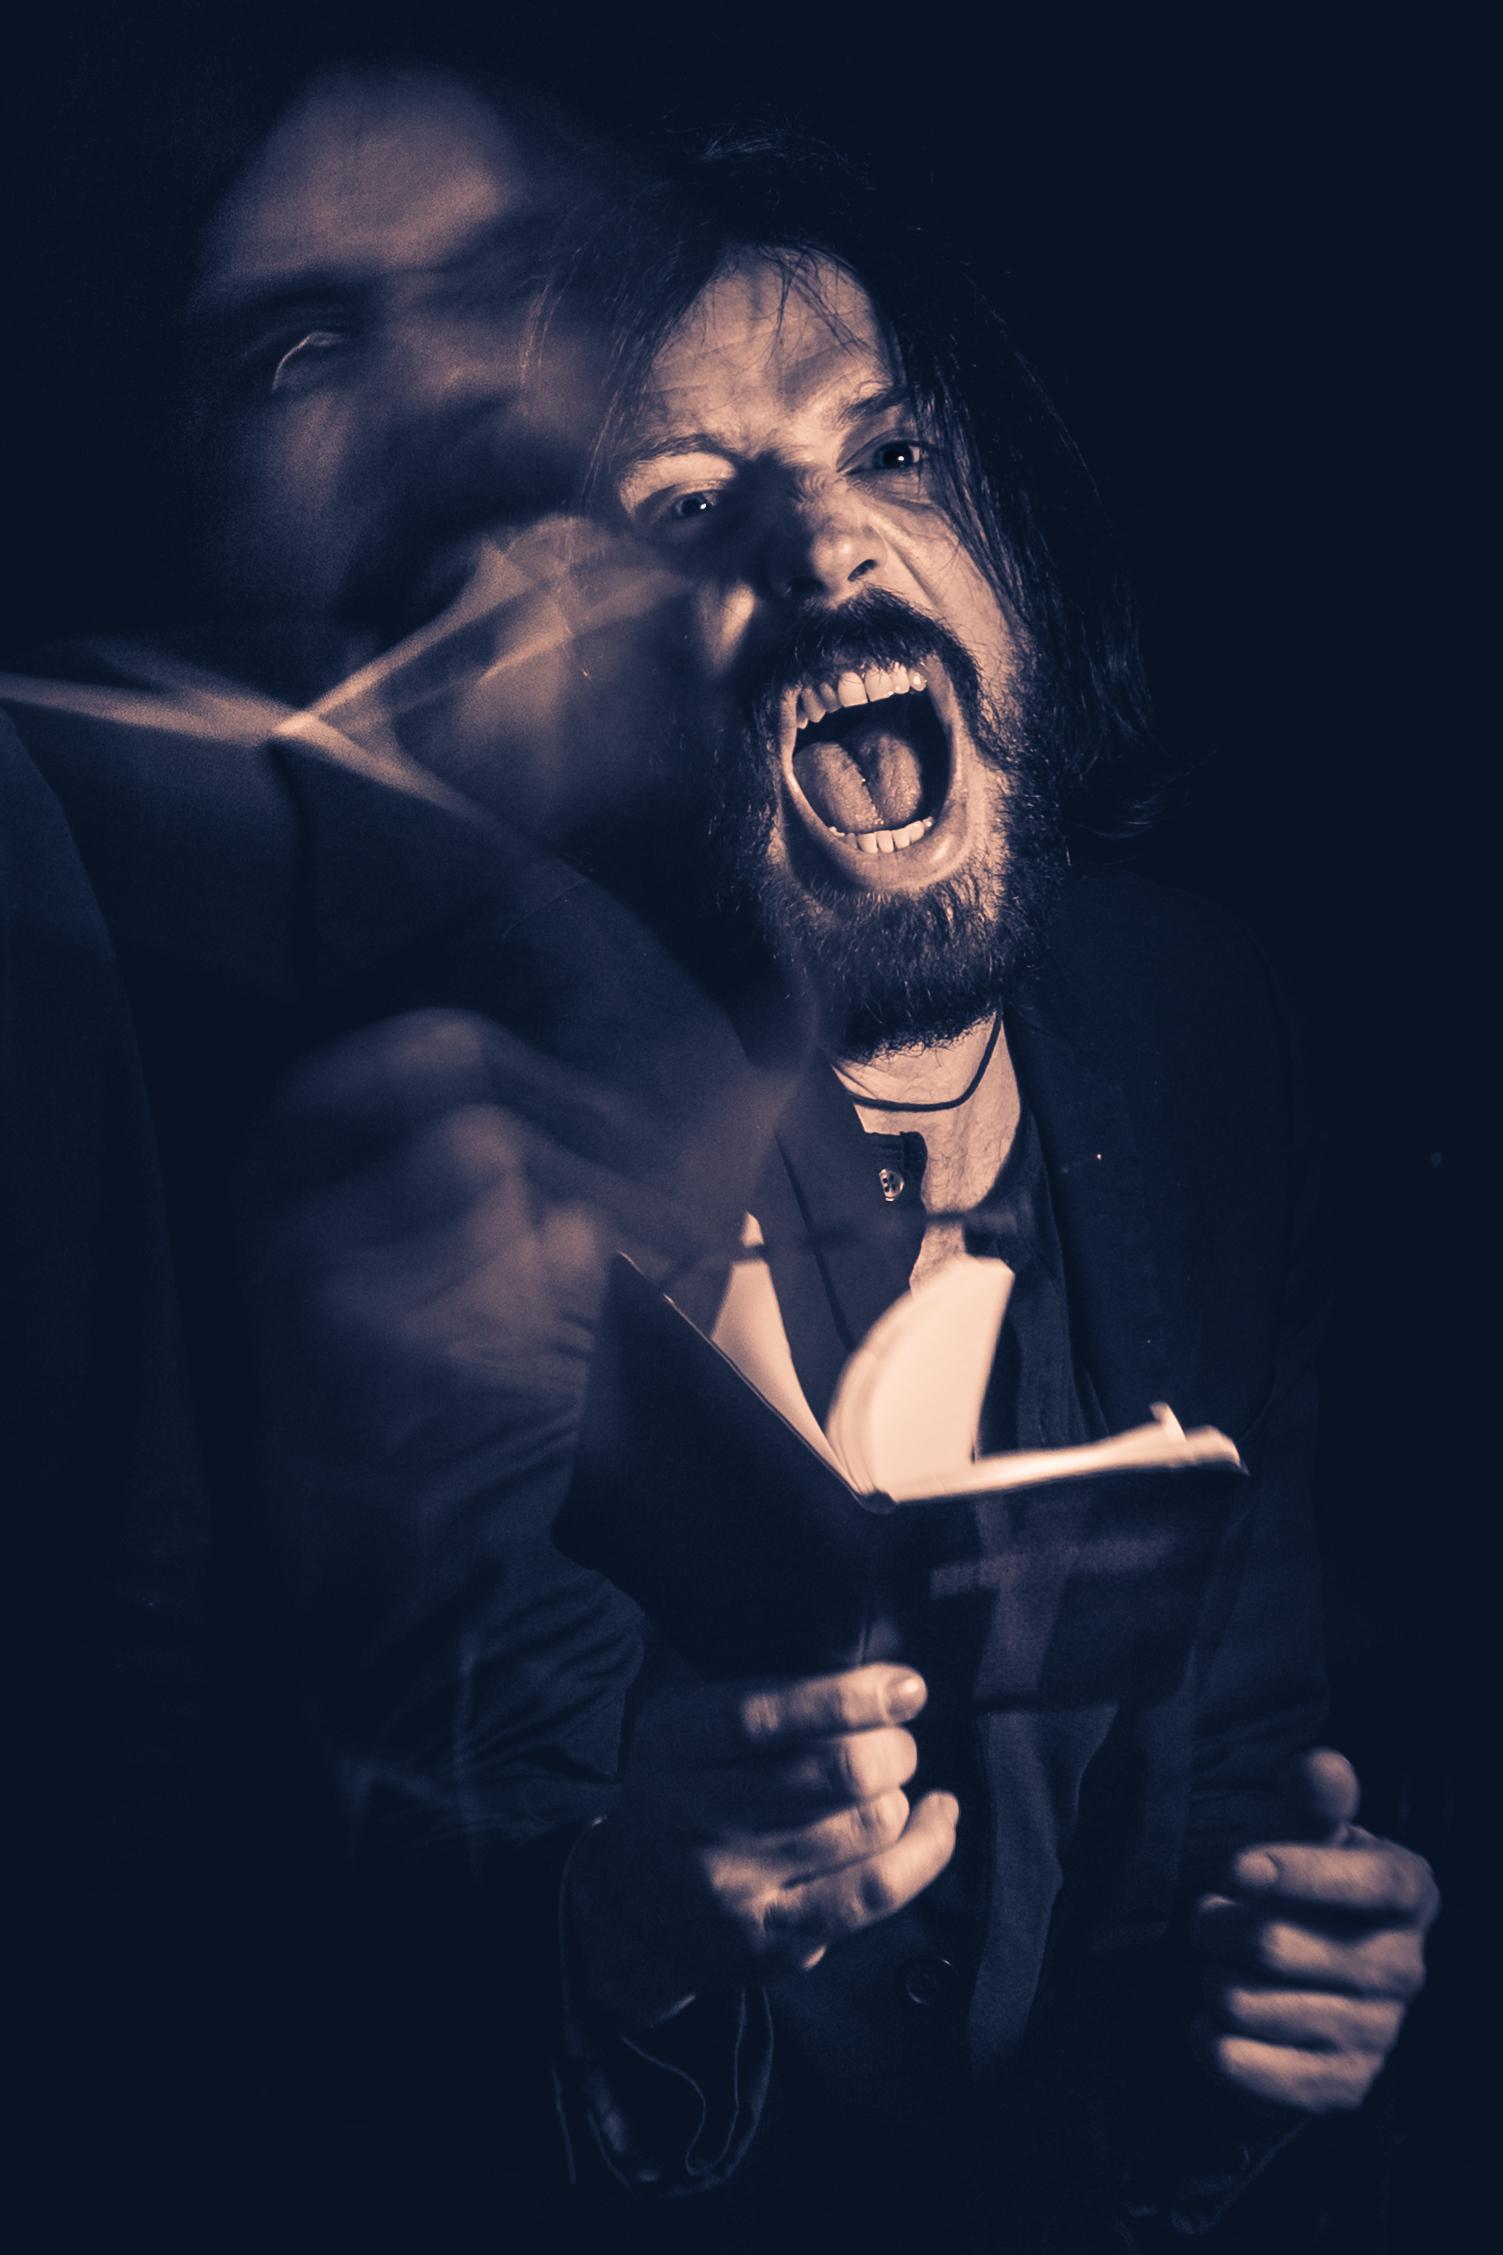 Bones Shake singer, David Brennan